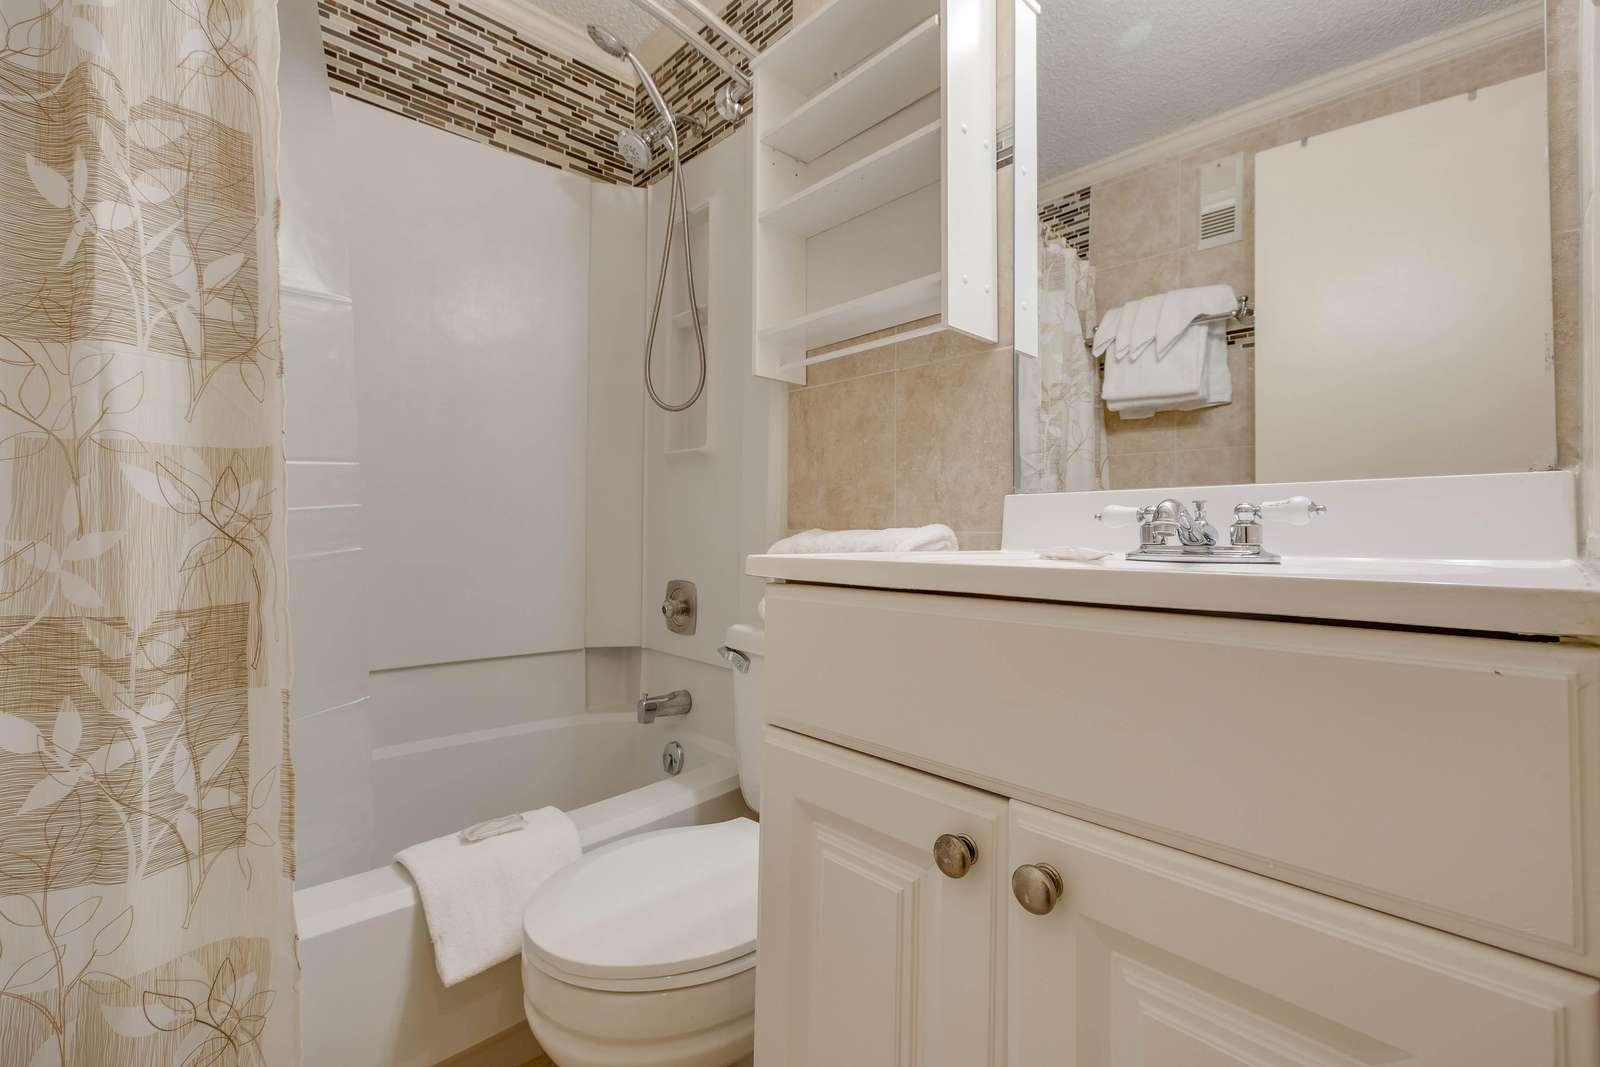 Spick and Span bathroom